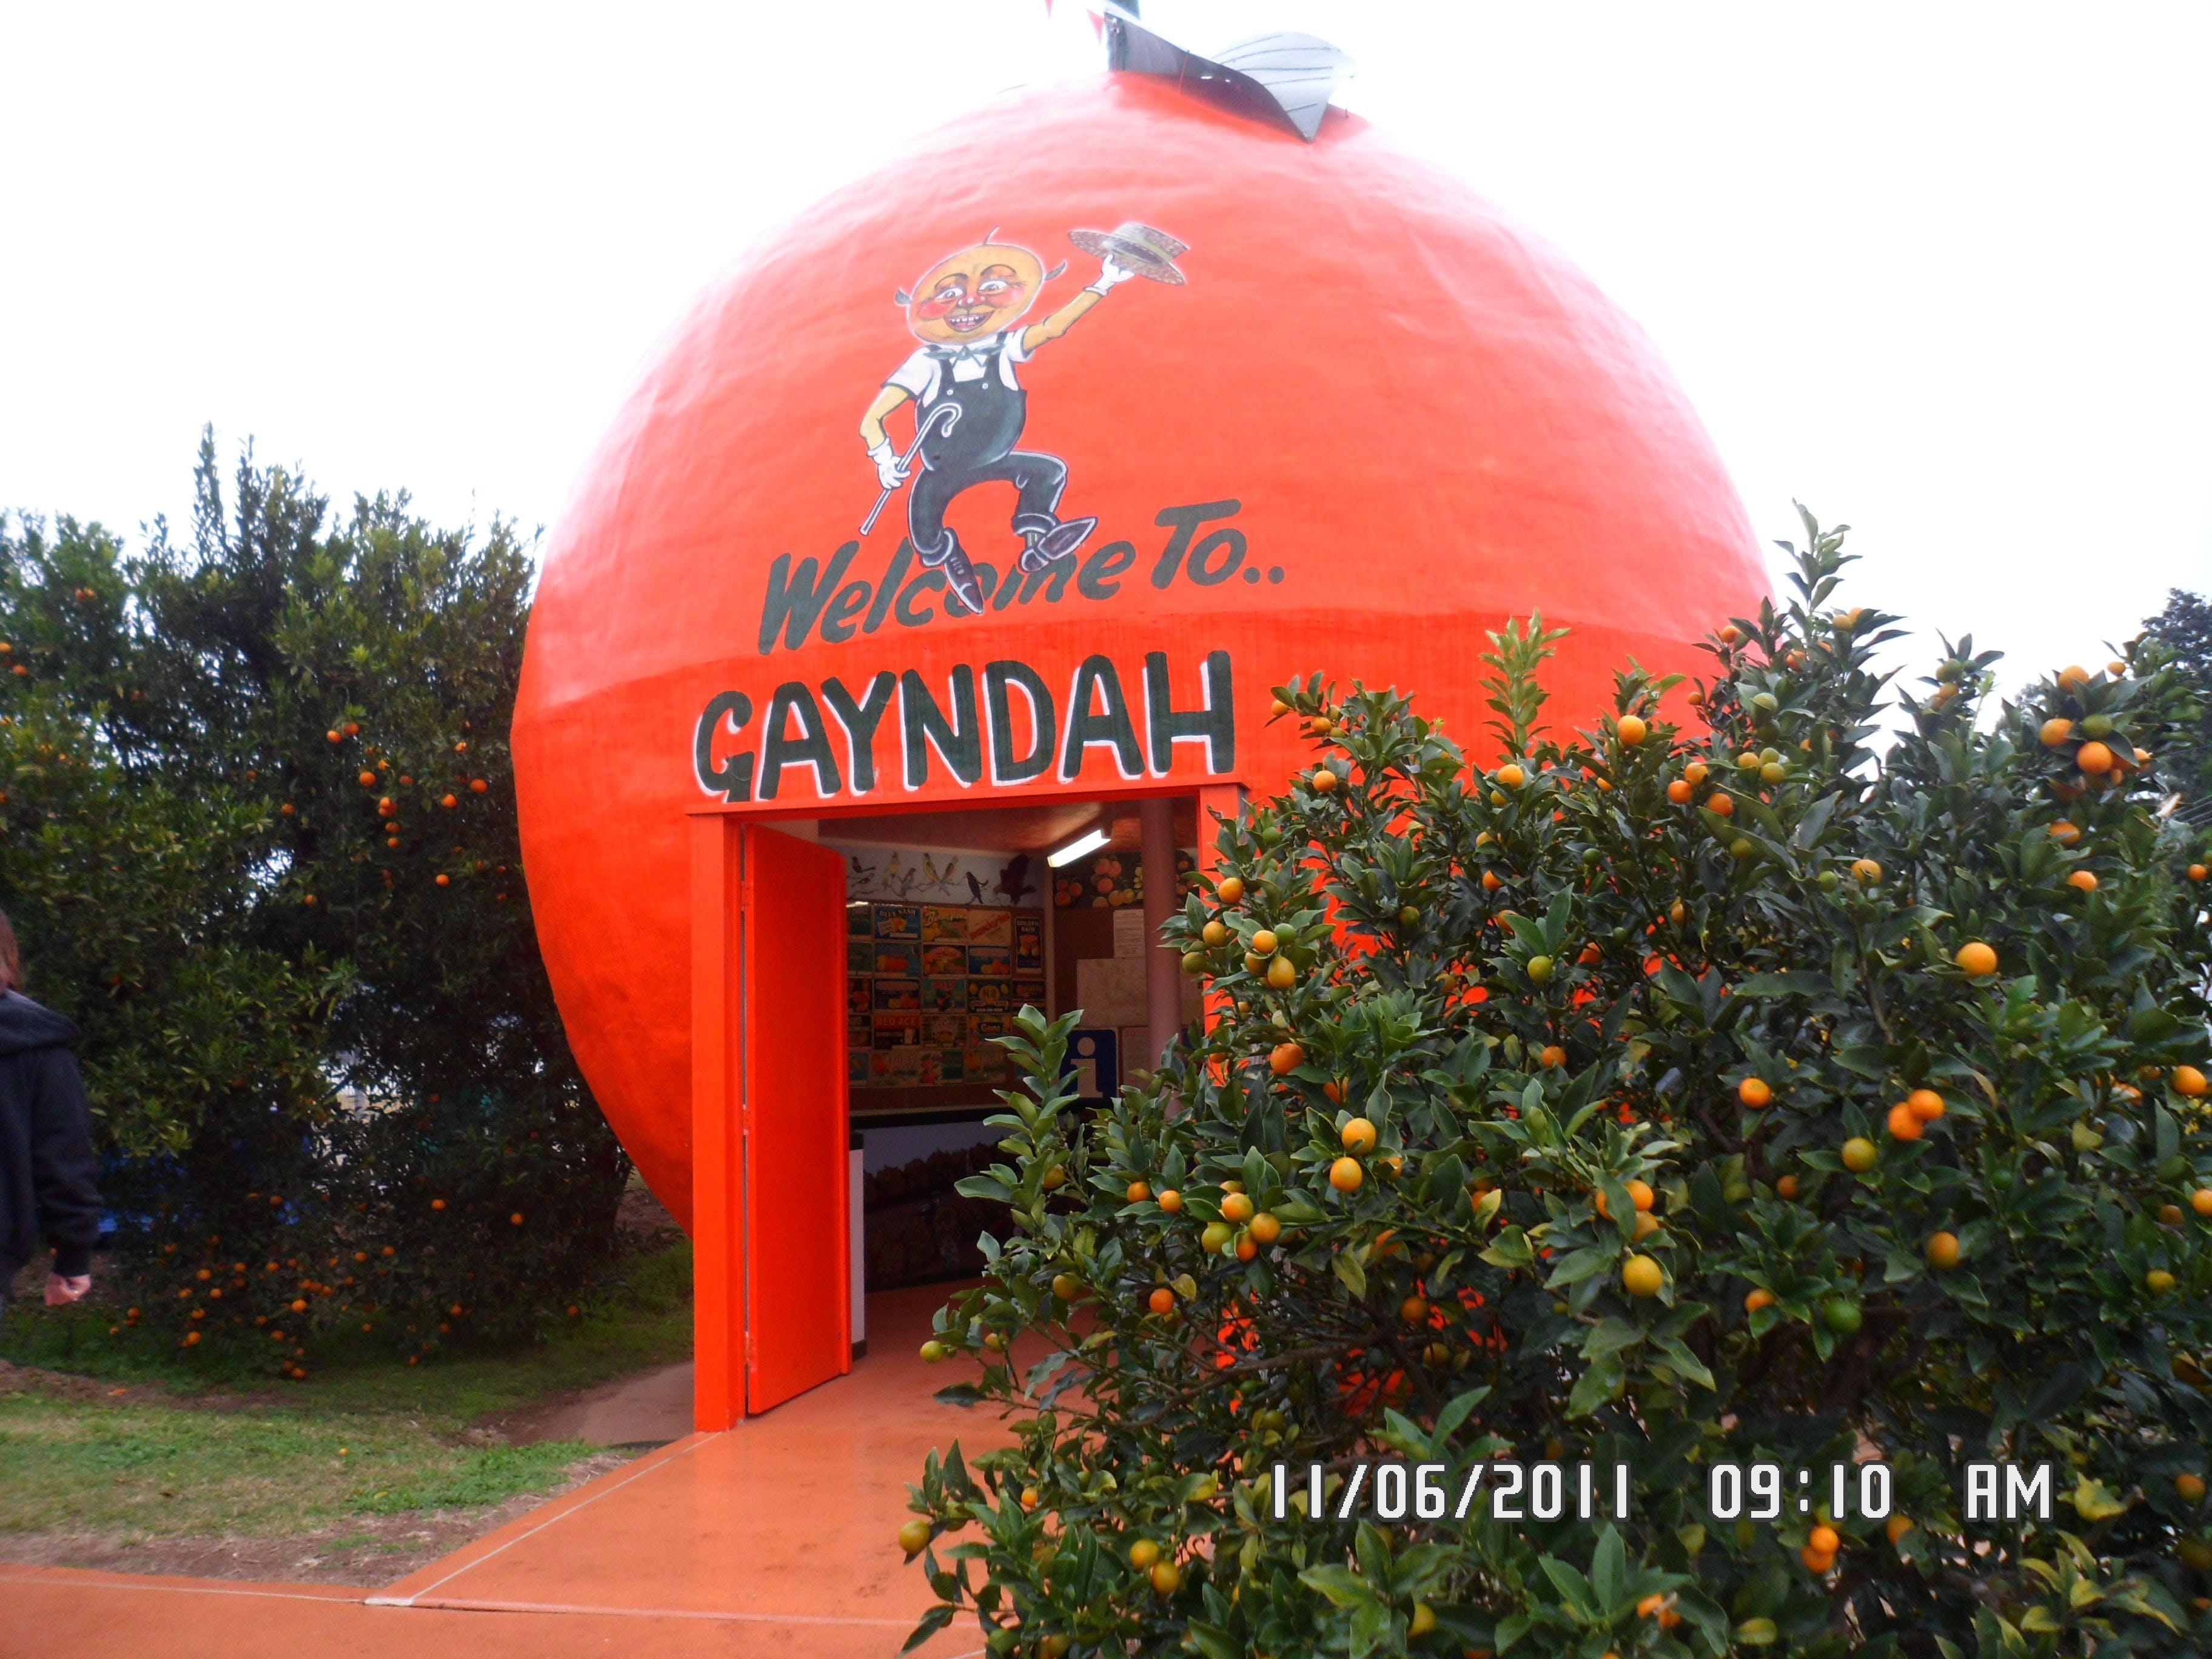 Gayndah's Big Orange Logo and Images